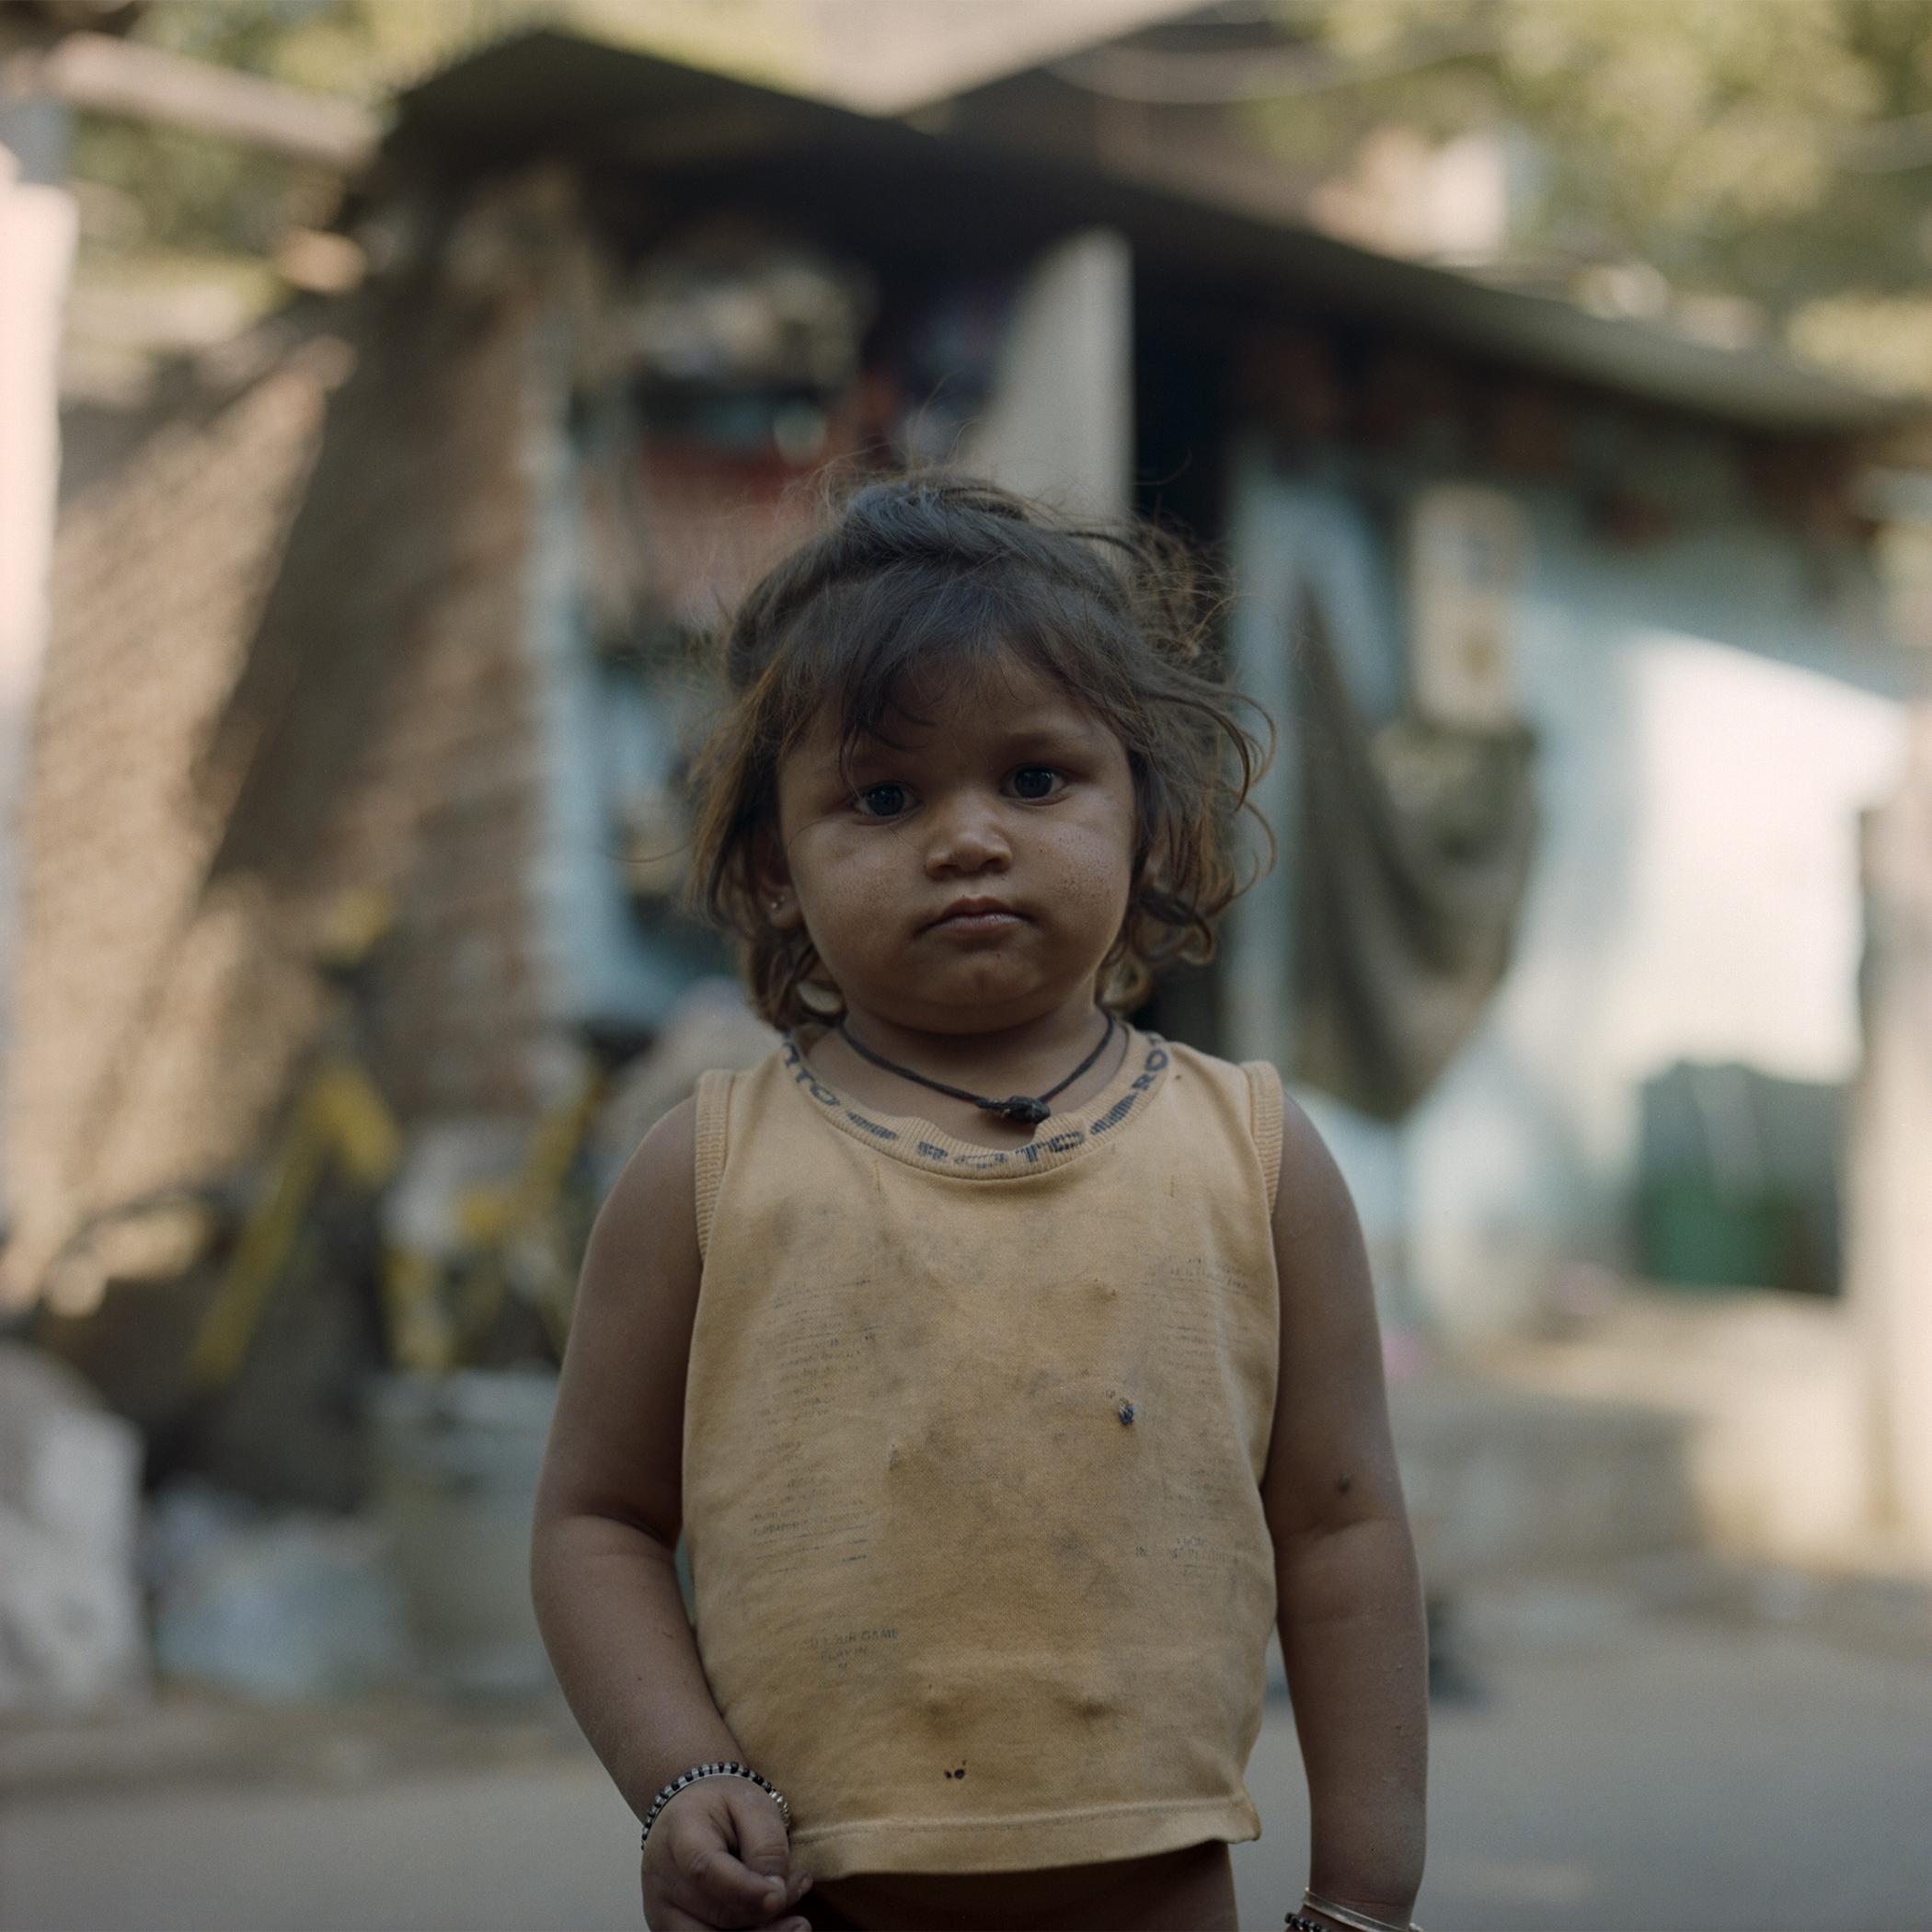 India 2010 - Photos by Ioannis koussertari